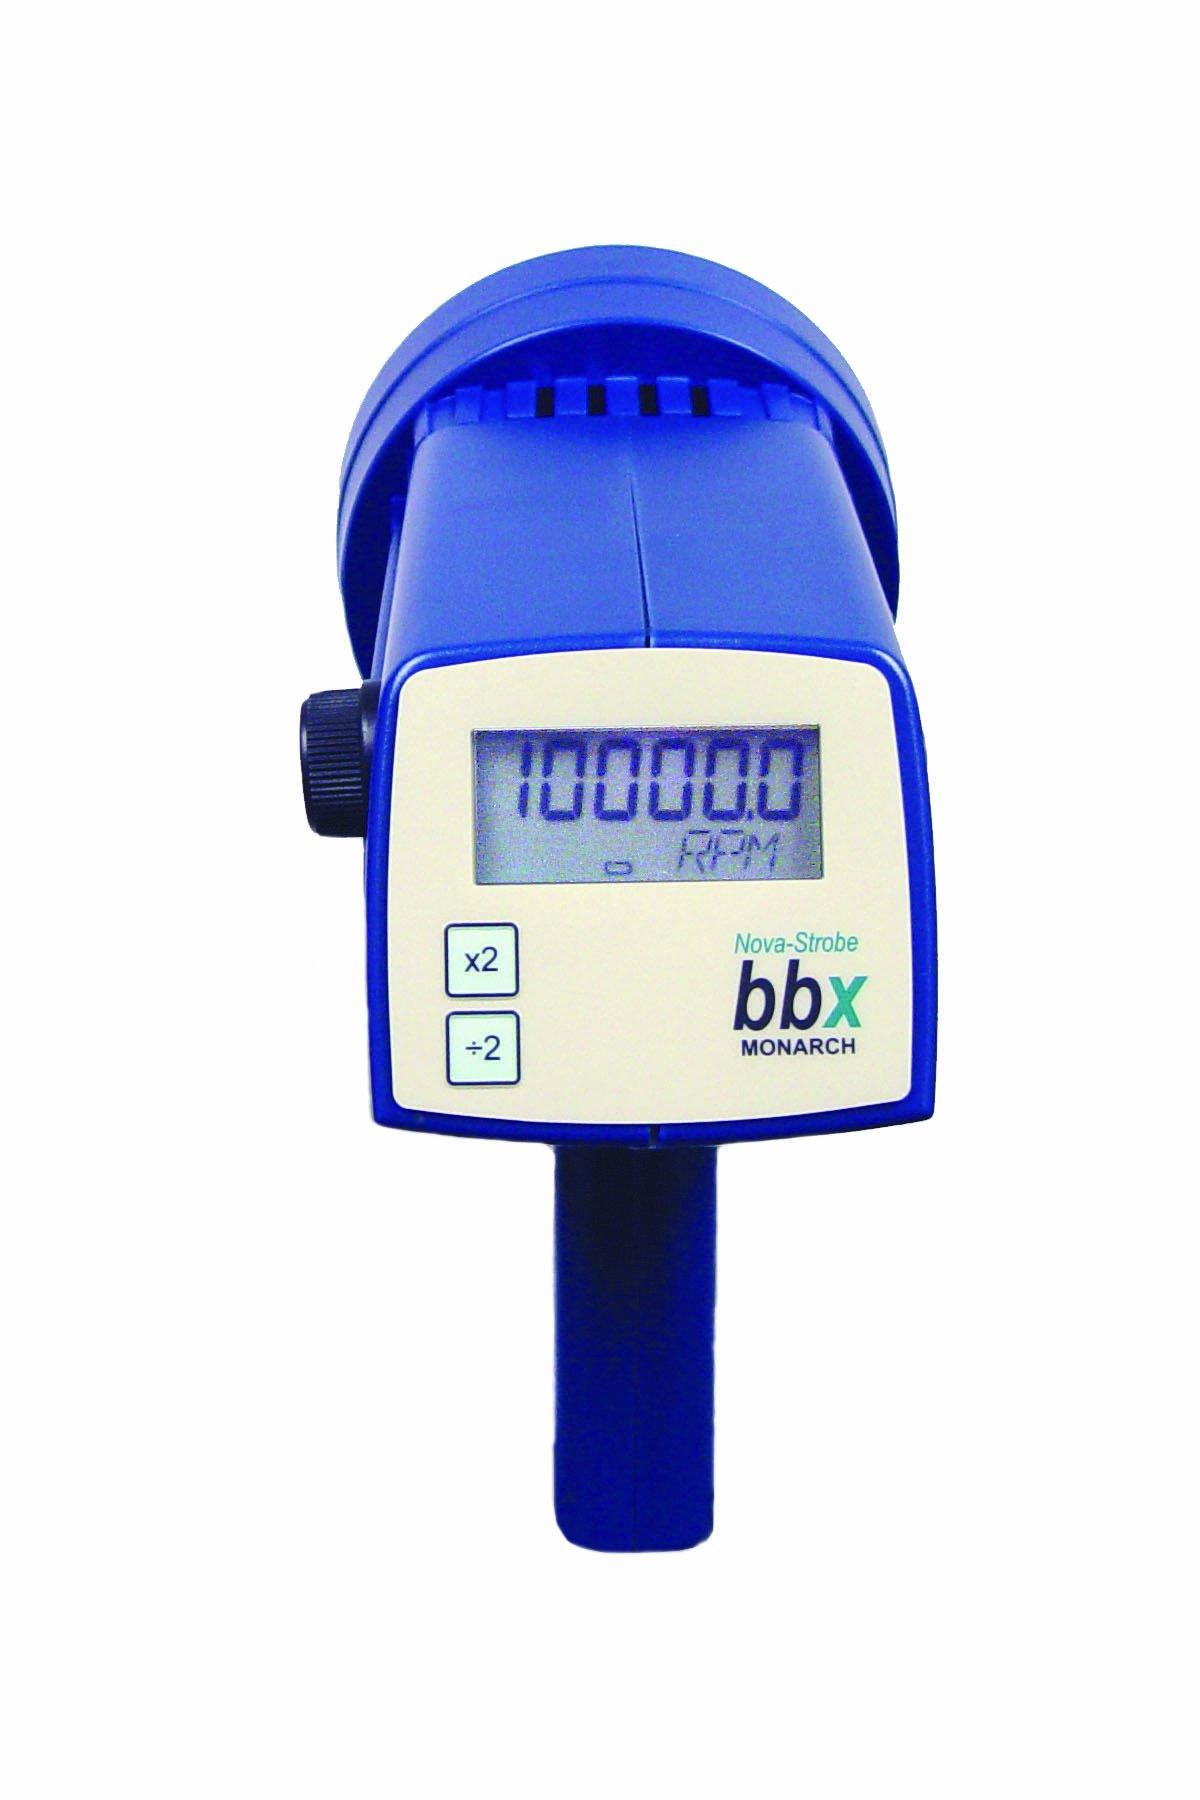 Monarch Nova-Strobe BBX 115/230 Digital Portable Stroboscope, Rechargeable, 7.81'' H x 9'' L x 3.66'' W by Monarch Instrument